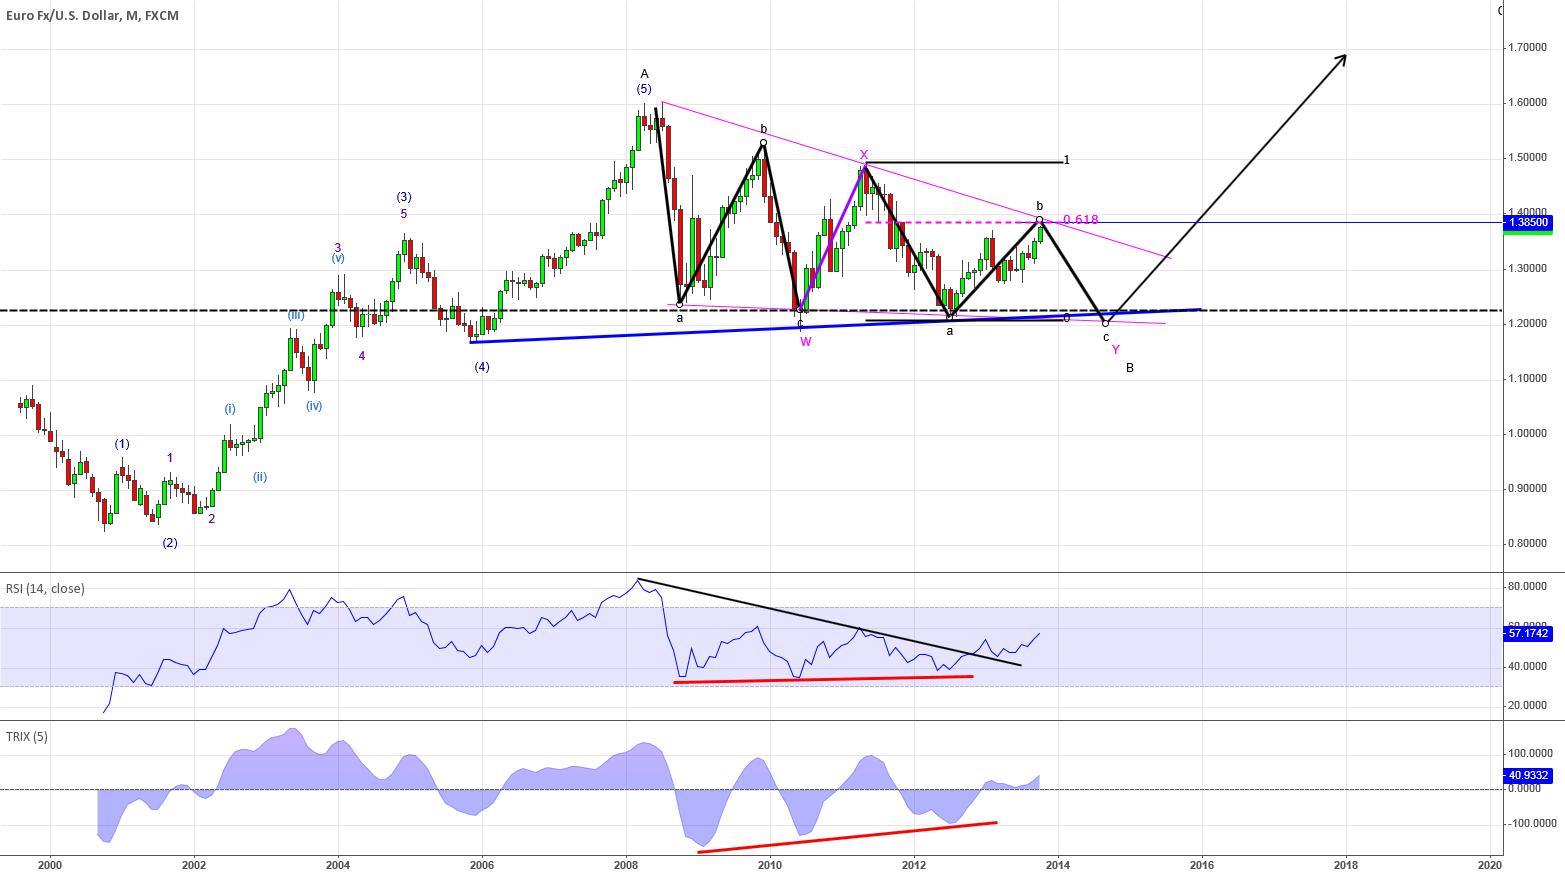 Major EURUSD reversal coming up..